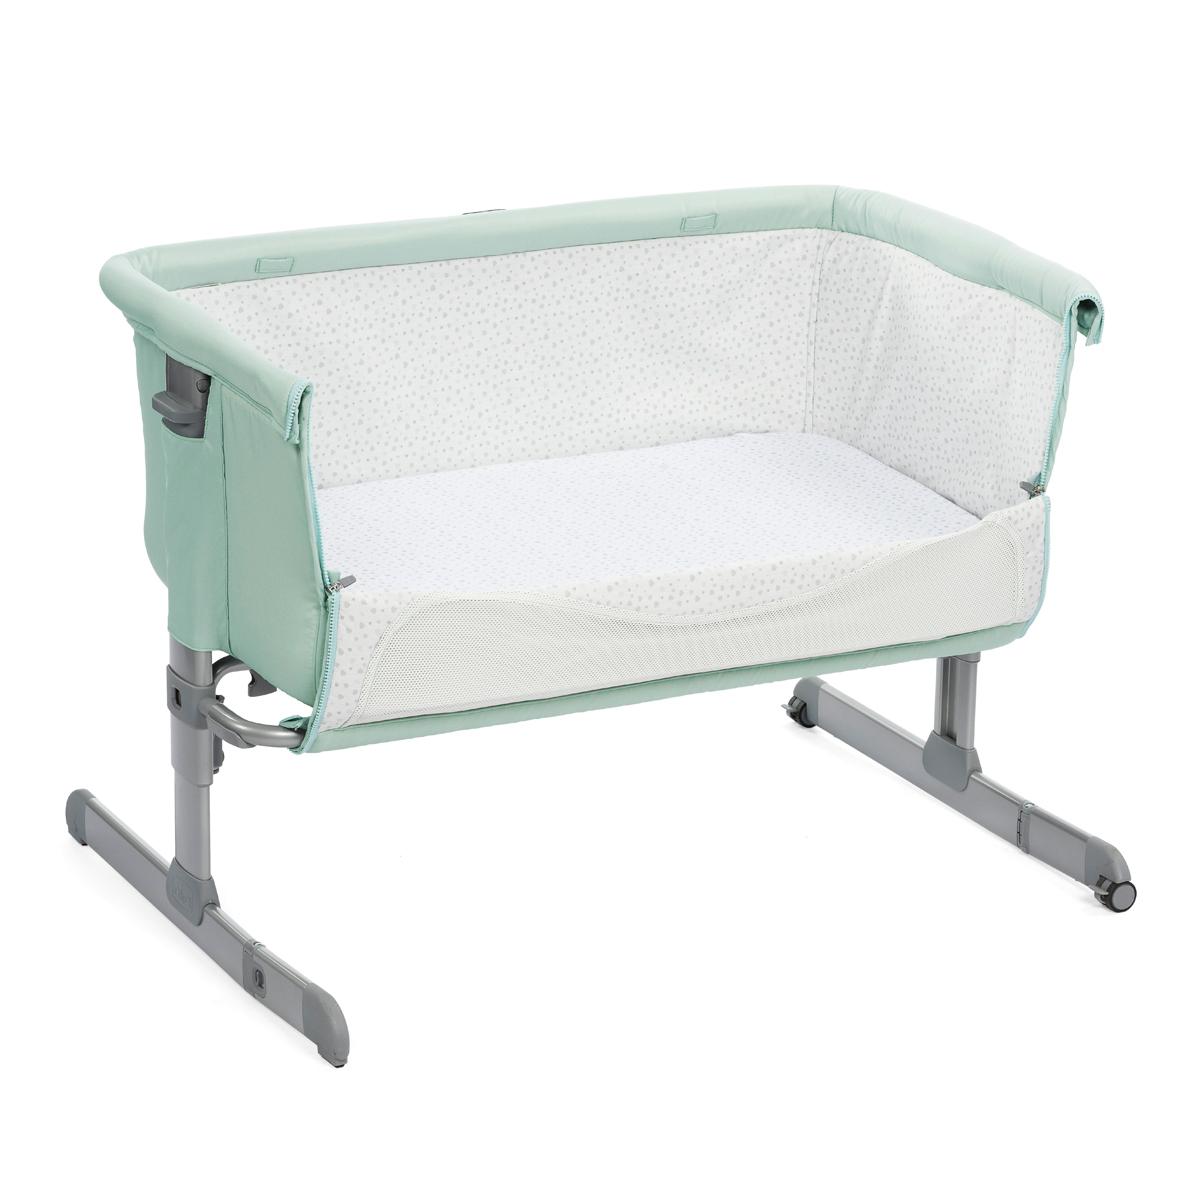 chicco berceau cododo next 2 me dusty green lit b b chicco sur l 39 armoire de b b. Black Bedroom Furniture Sets. Home Design Ideas